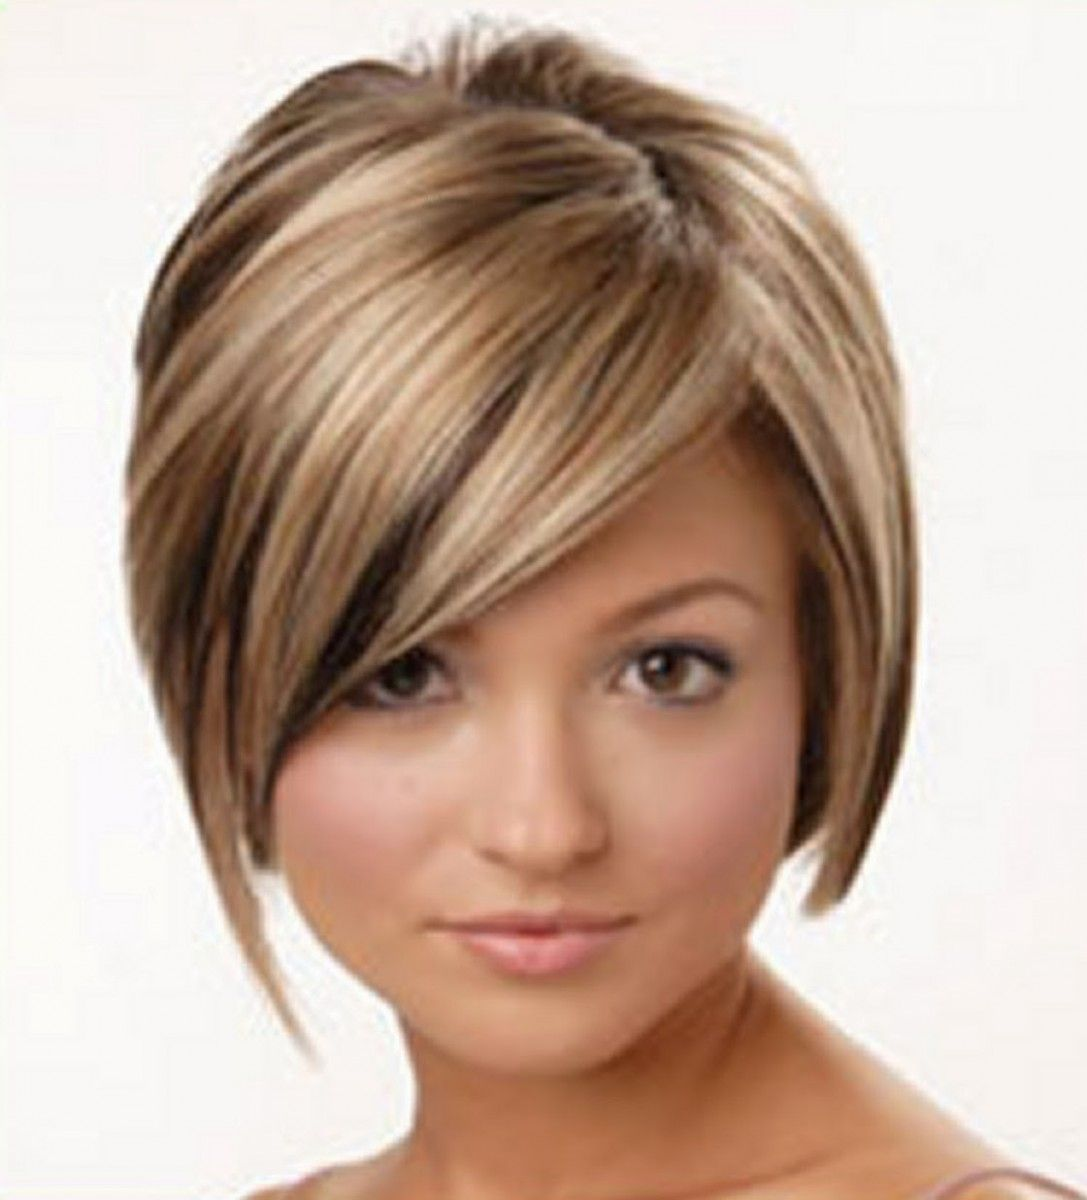 Short hairstyles for fine hair shorthairstylesforwomenwith